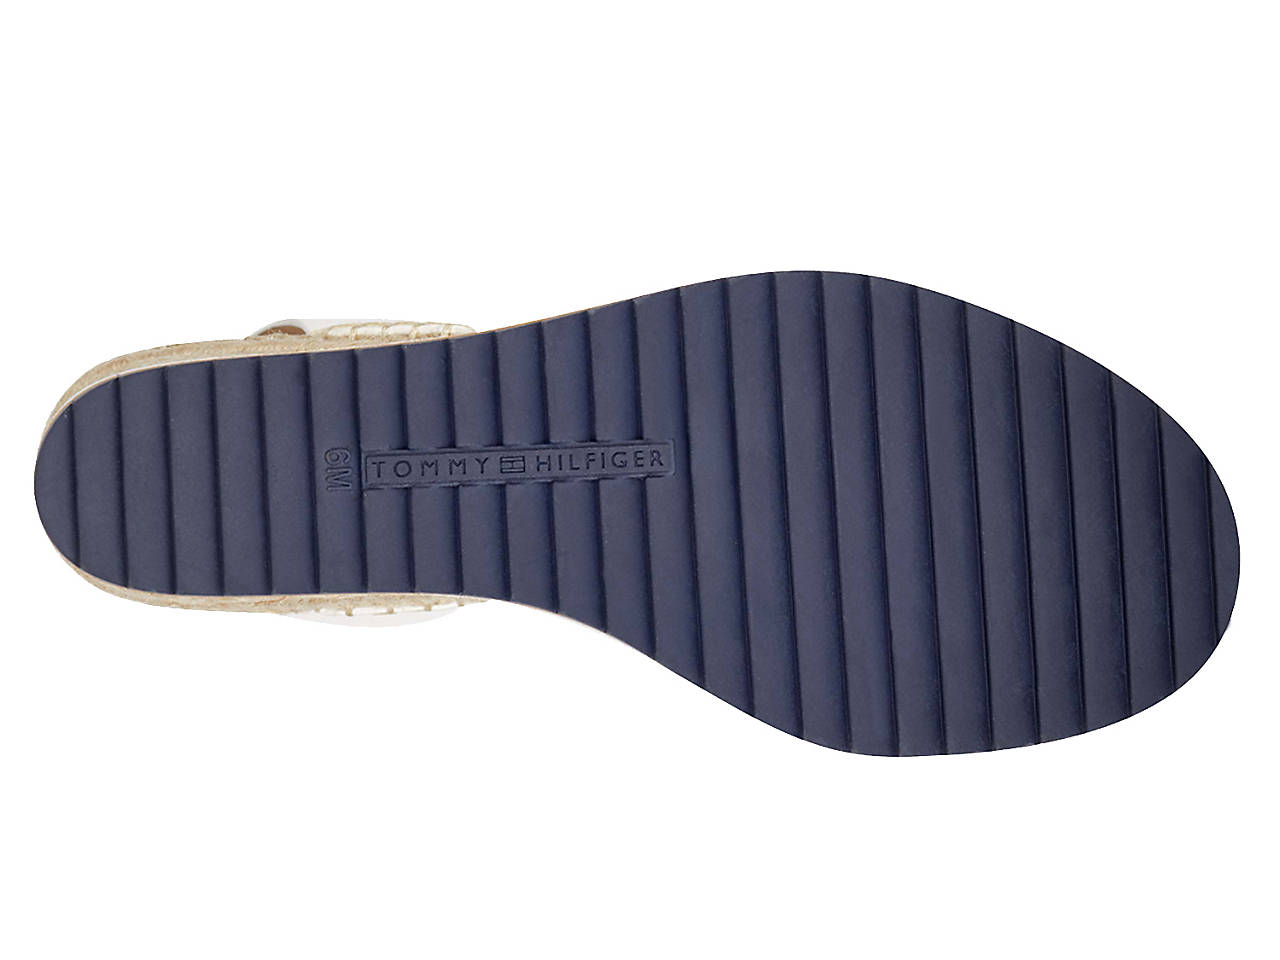 c51d4a3dd6f Tommy Hilfiger Yaslin 3 Wedge Sandal Women s Shoes